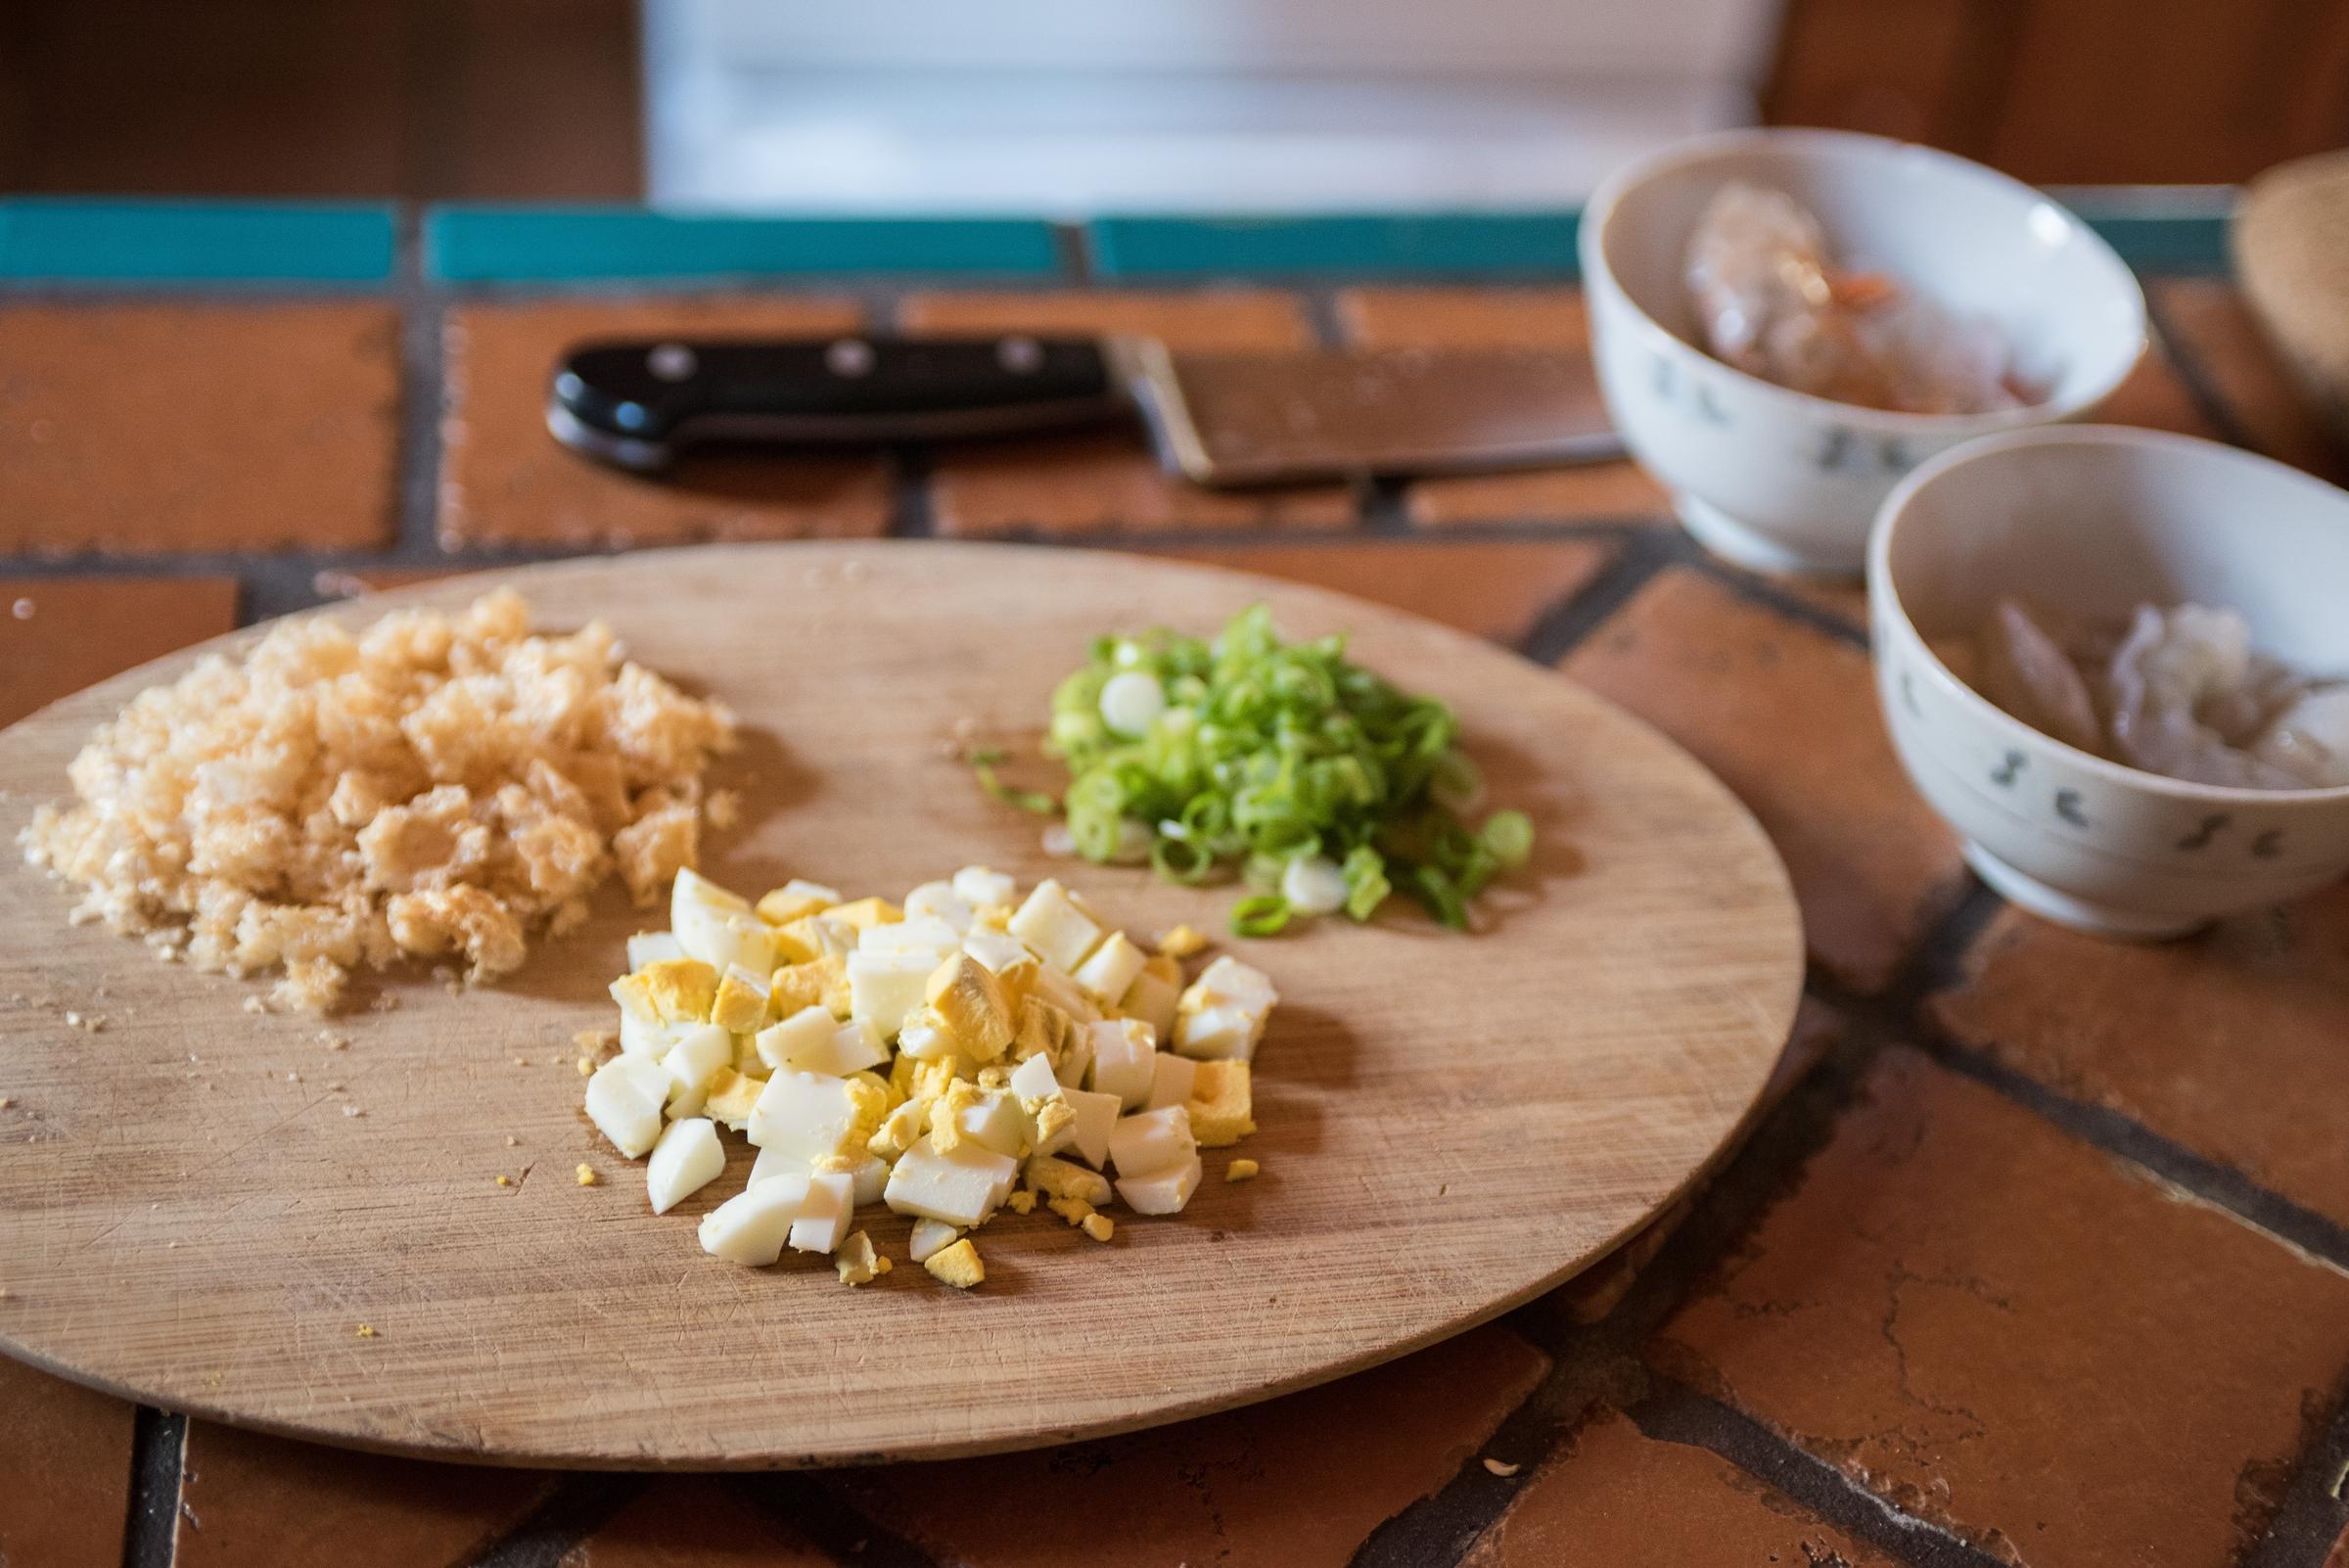 Noodles in Palabok Sauce Garnishes